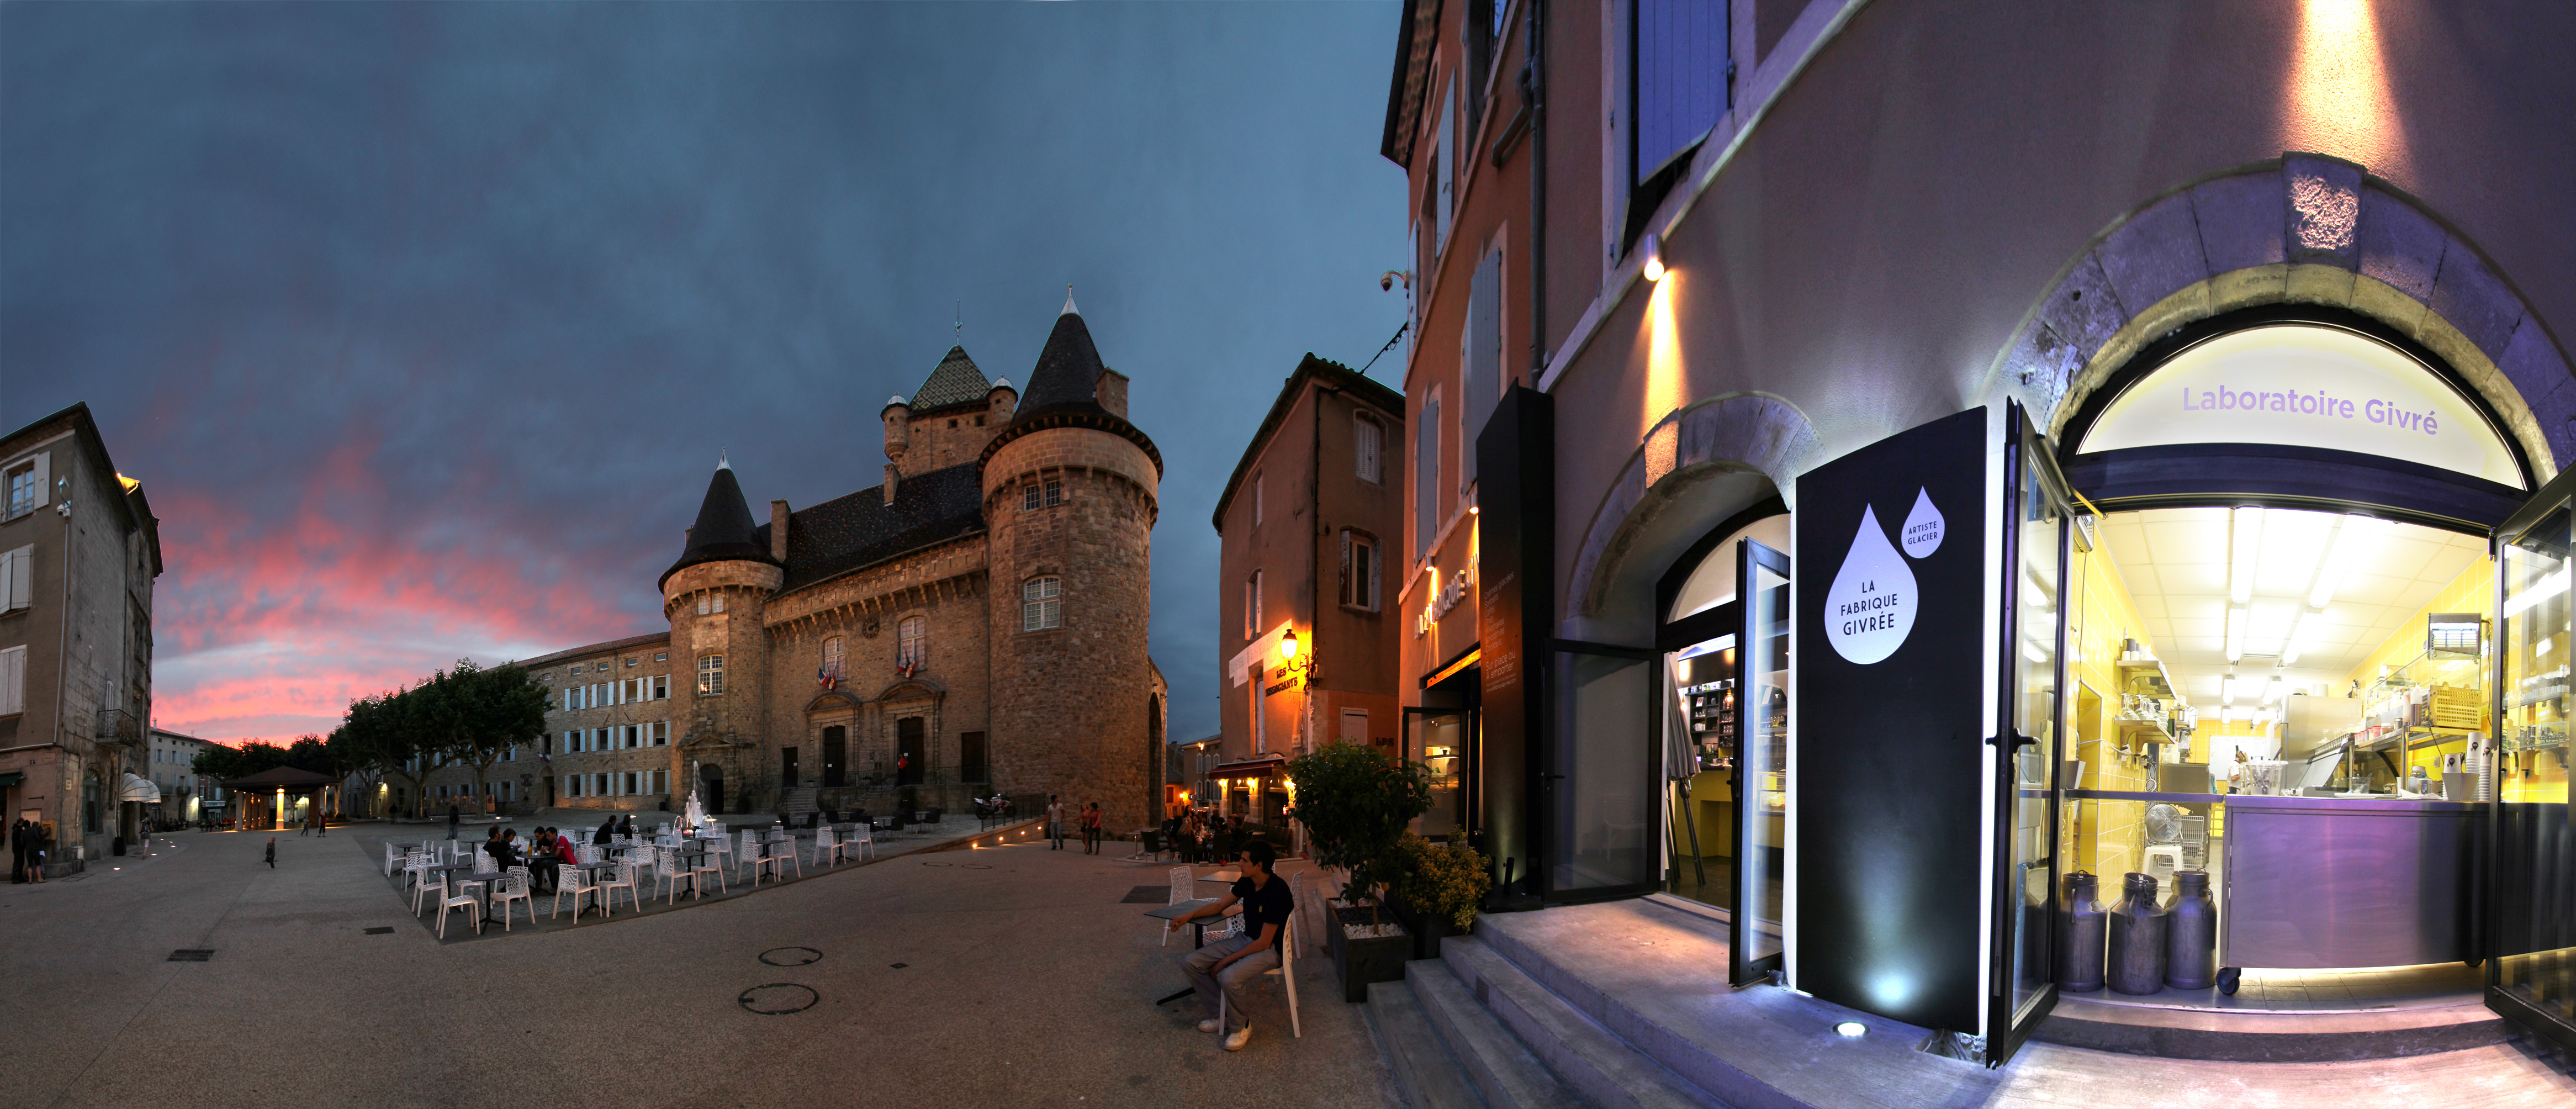 _LABO&chateau